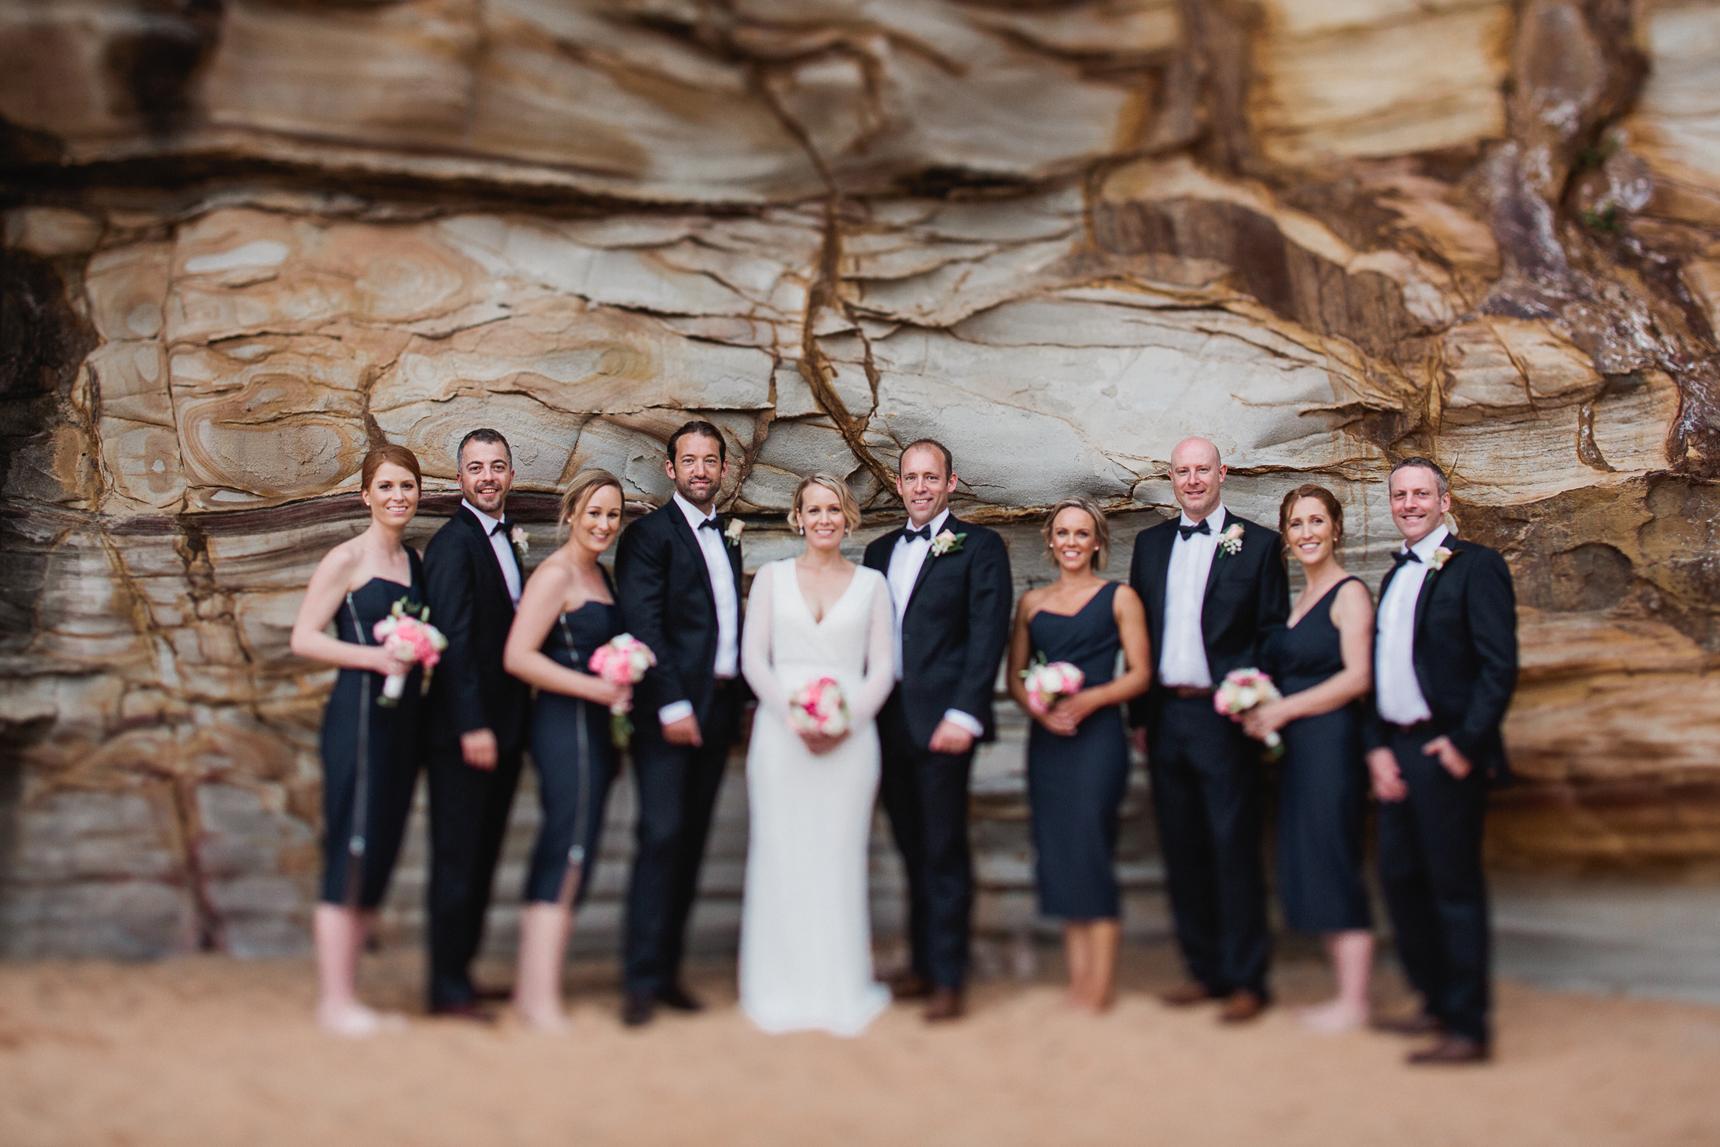 AngeRuss_MobyDicks_WhaleBeach_Wedding_Photography033.jpg